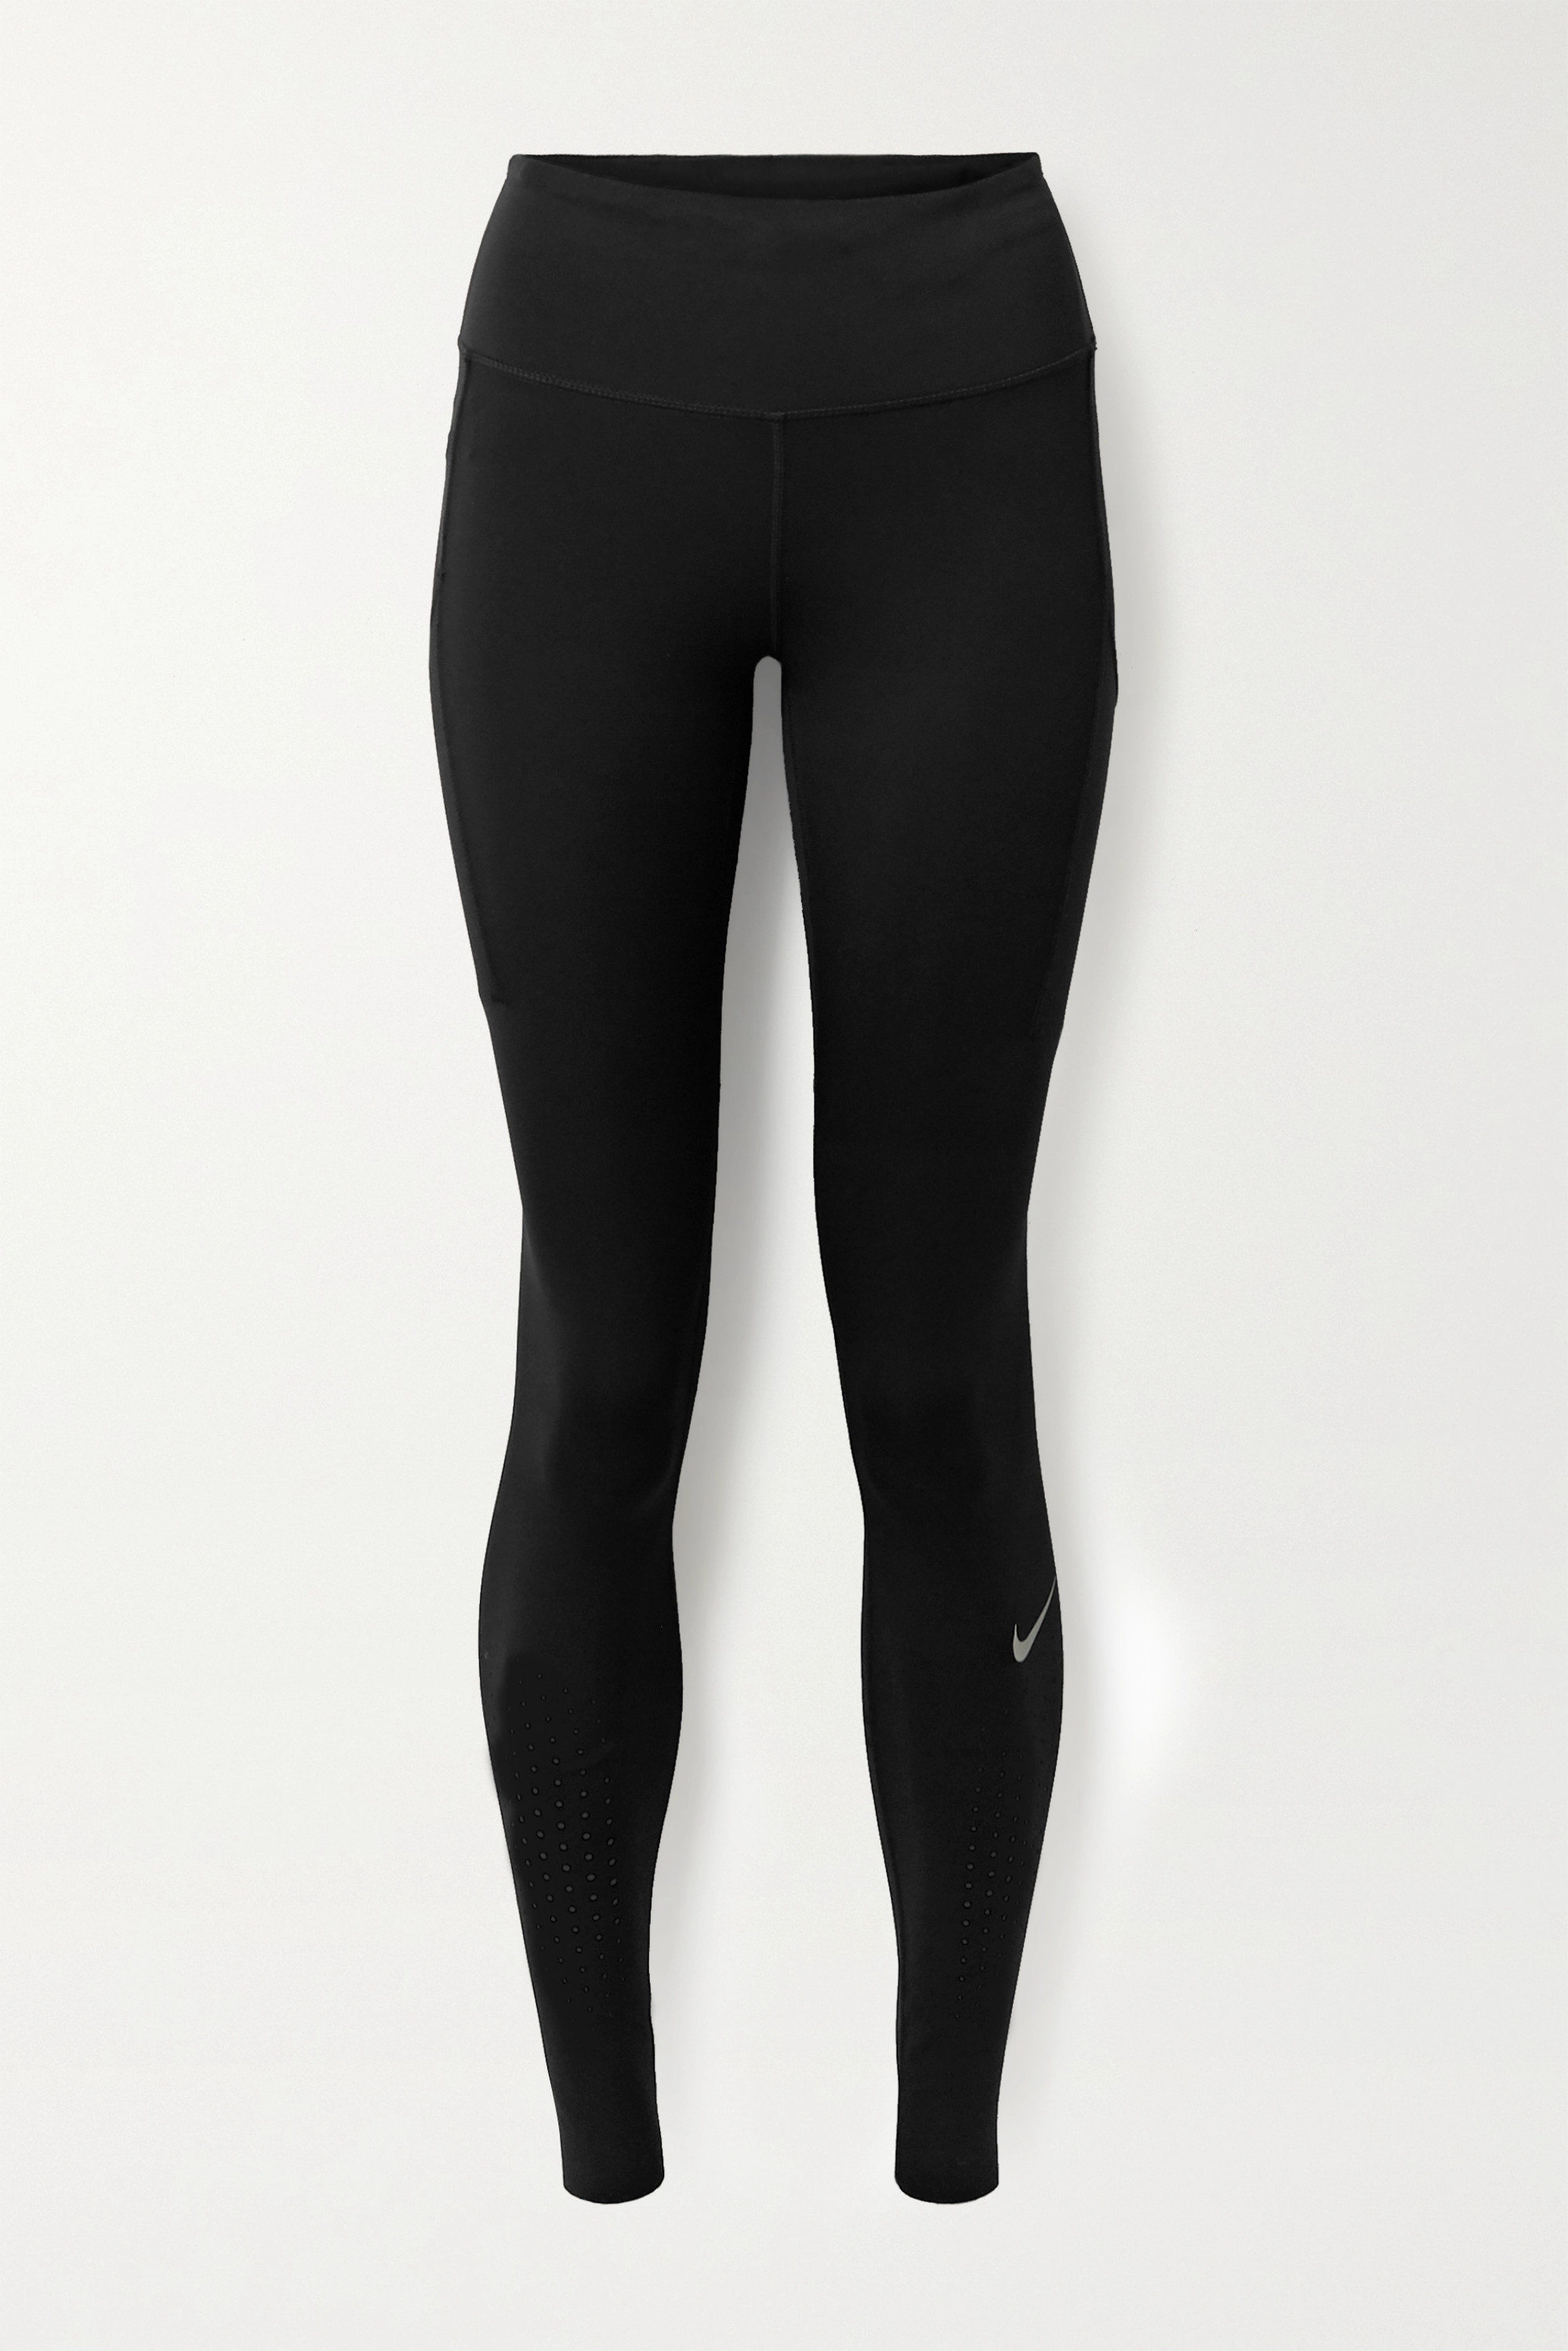 Nike Epic Lux perforated Dri-FIT leggings